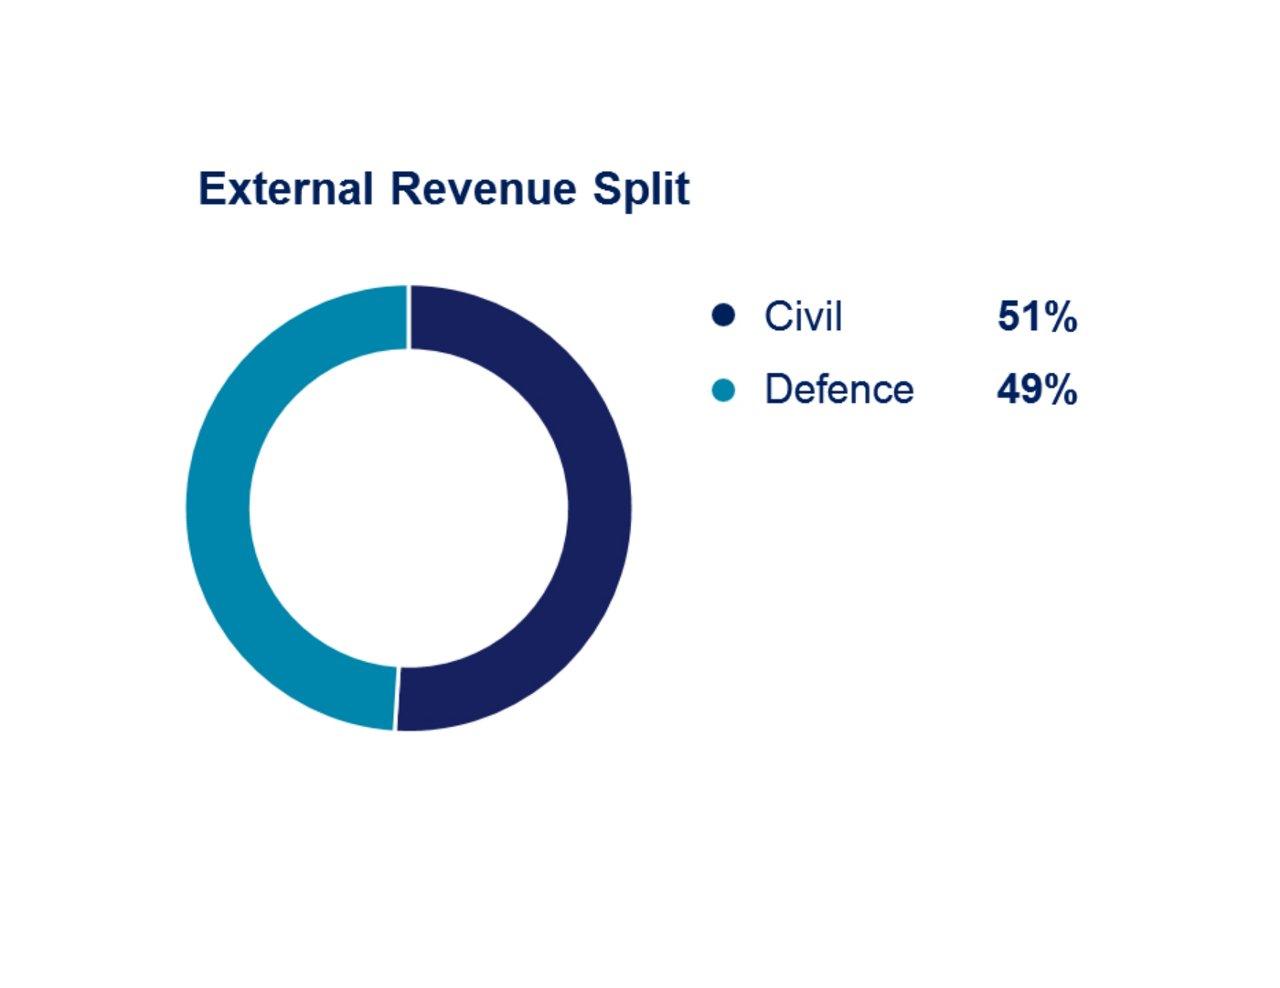 Airbus 9m 2019 Helicopters External Revenue Split 1